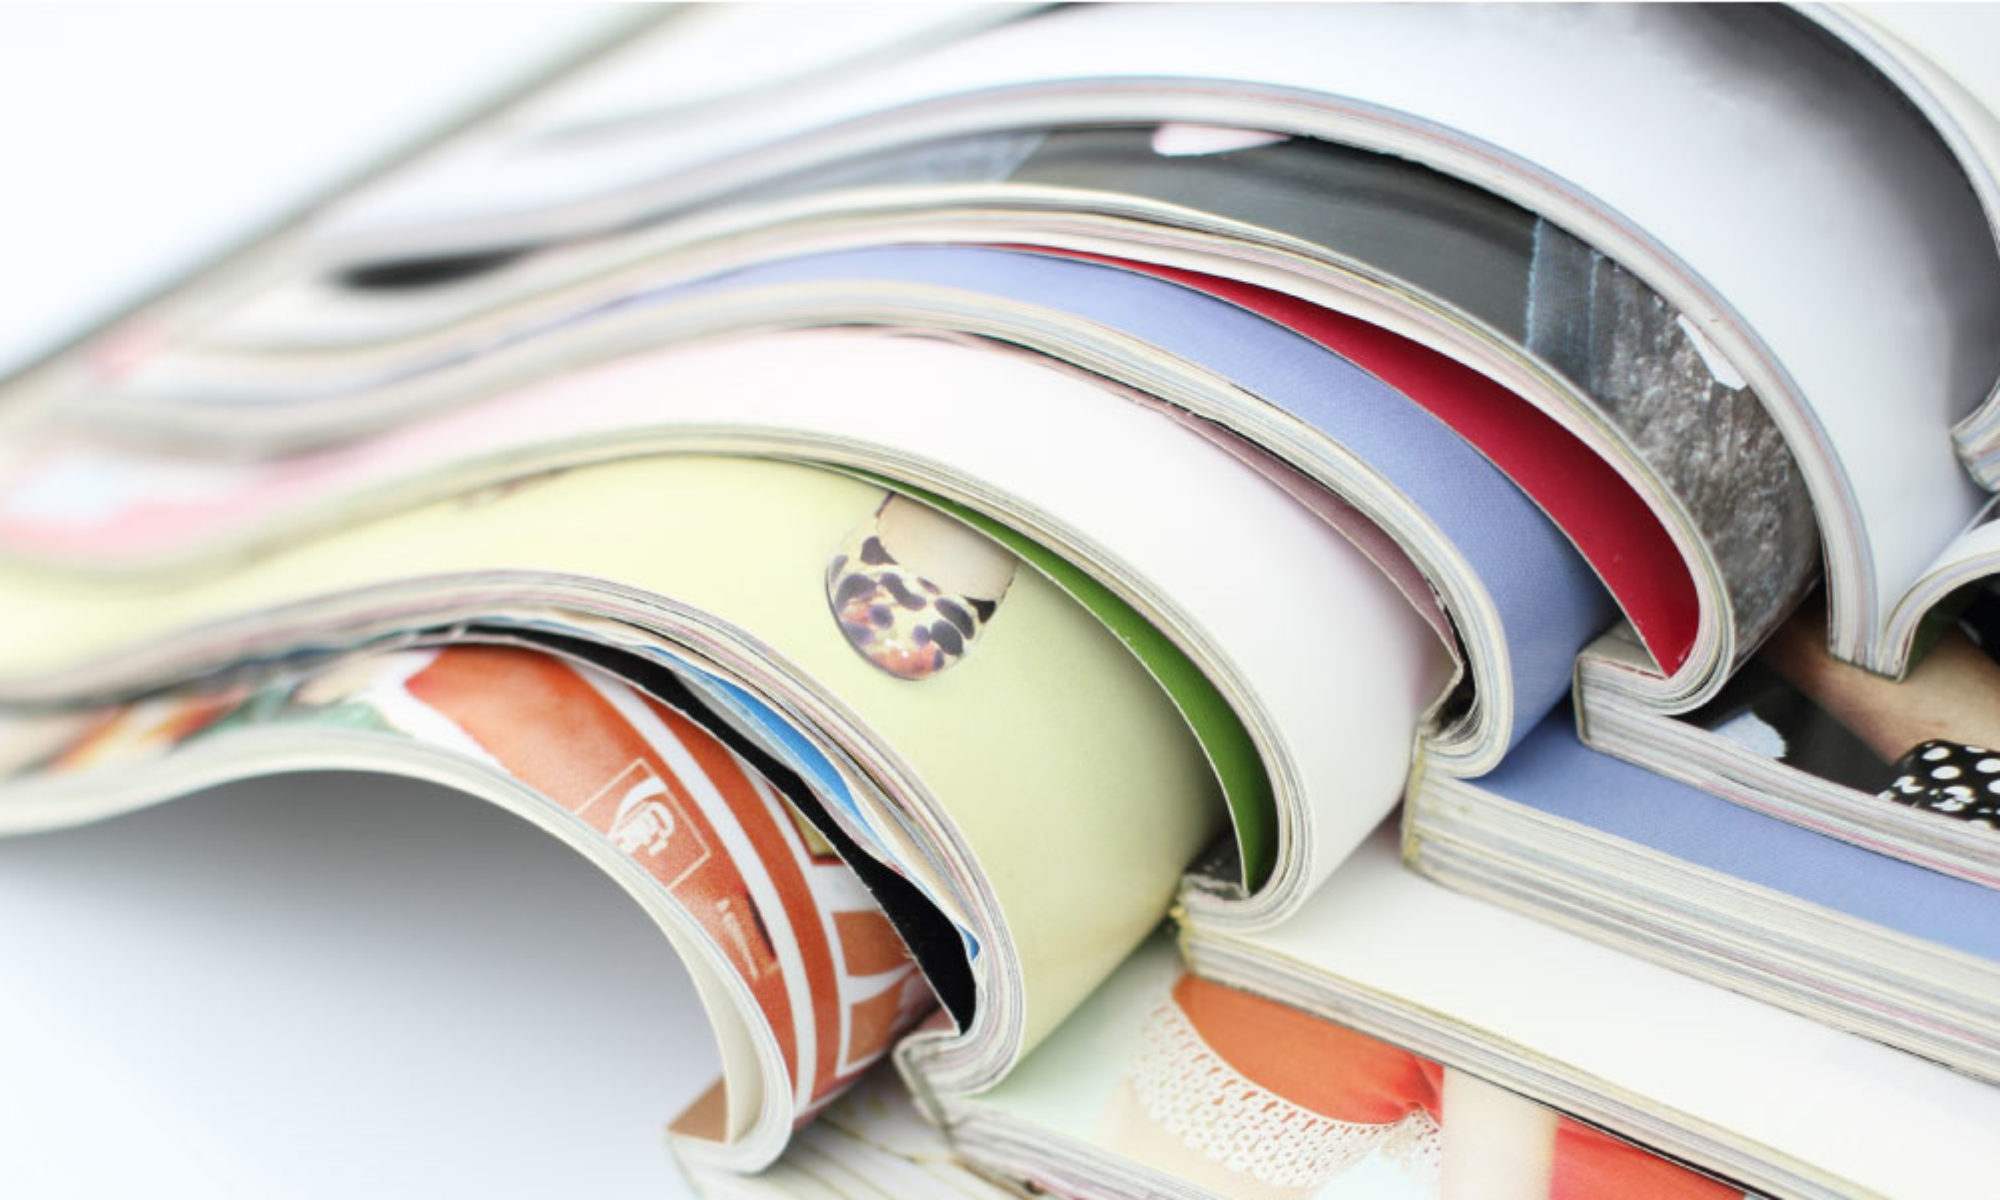 impresión de revistas